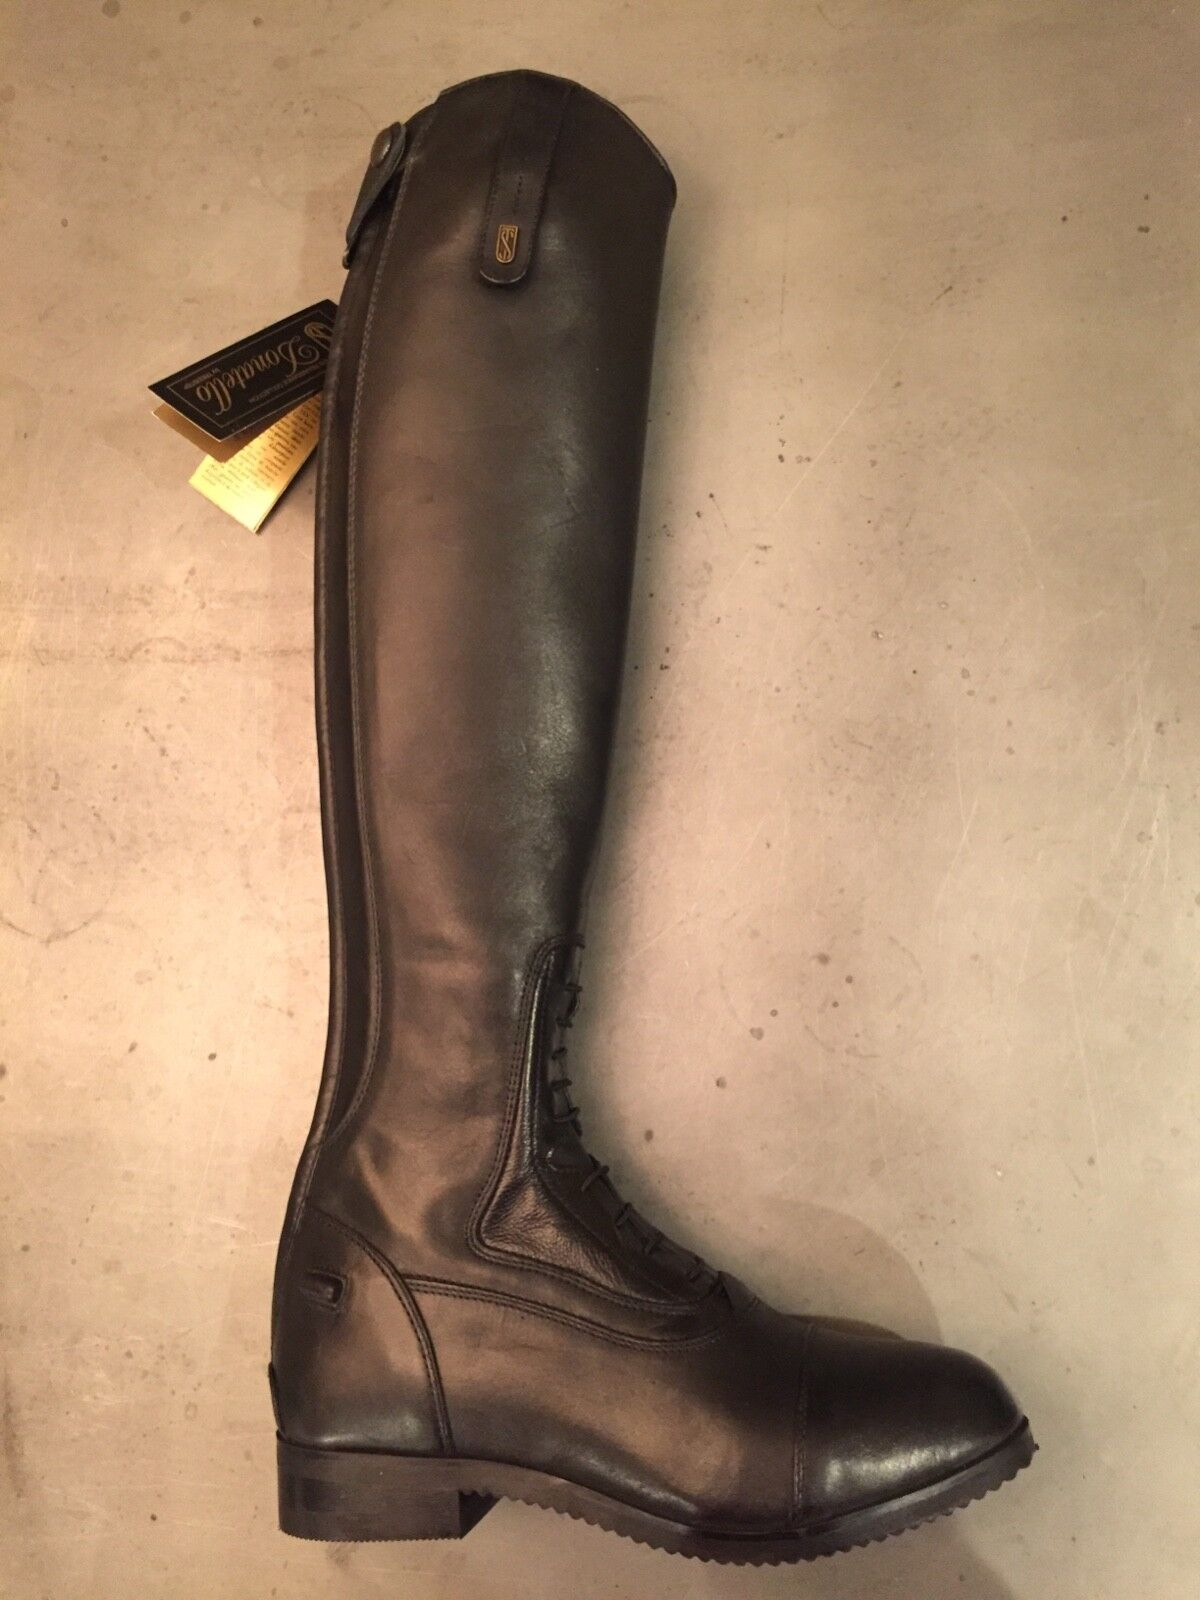 Nuevas botas De Campo negro Trojostep Donatello  2, Reg Pantorrilla 14 , alto altura 19